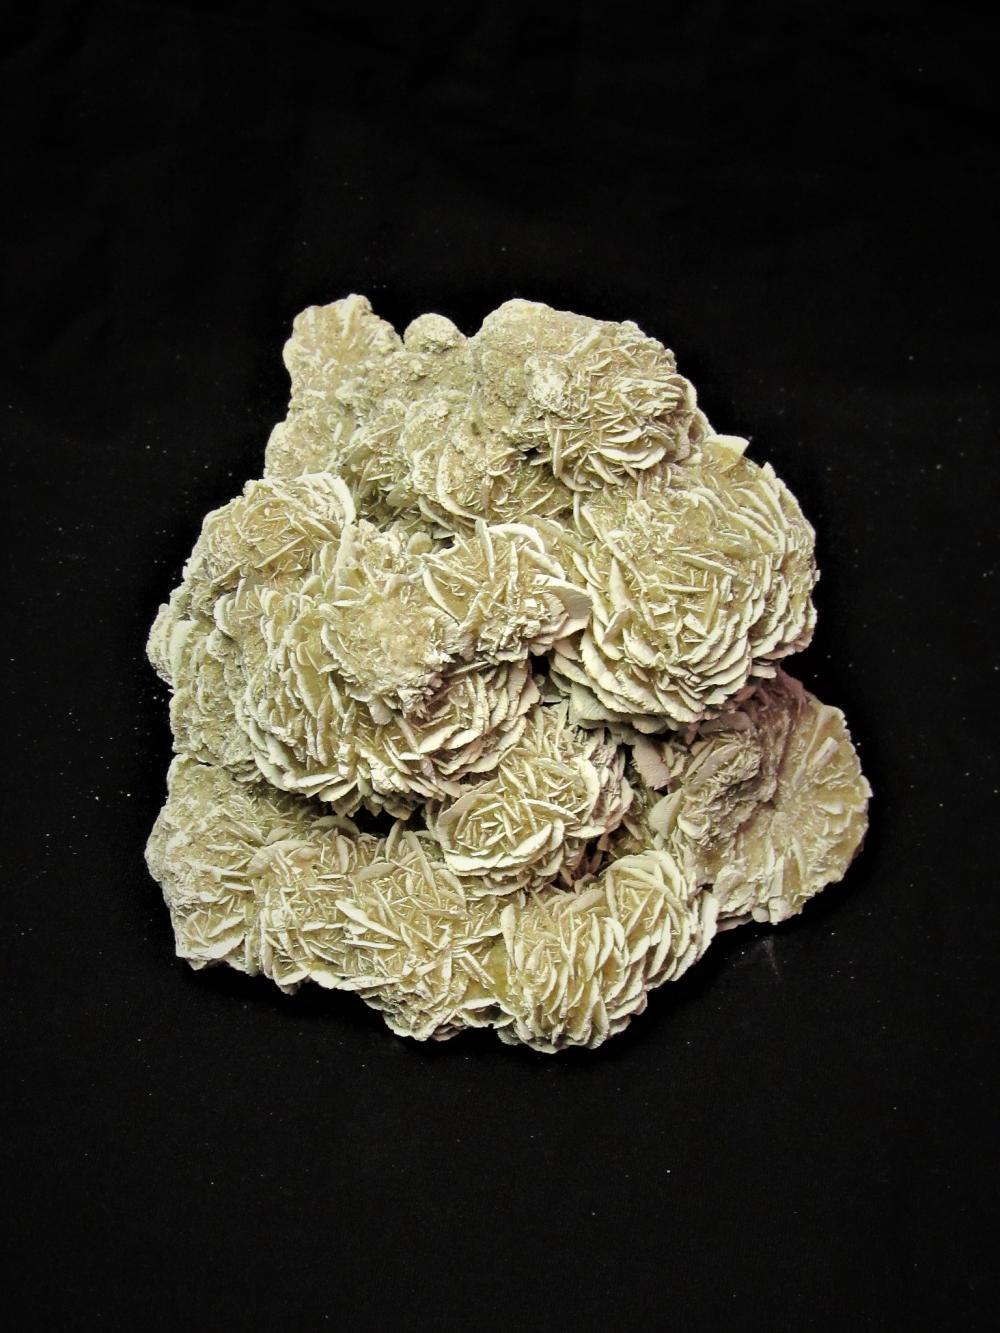 Desert Rose Crystal Gypsum Sand Roses Rose Mineral Specimen Spirit Guardian